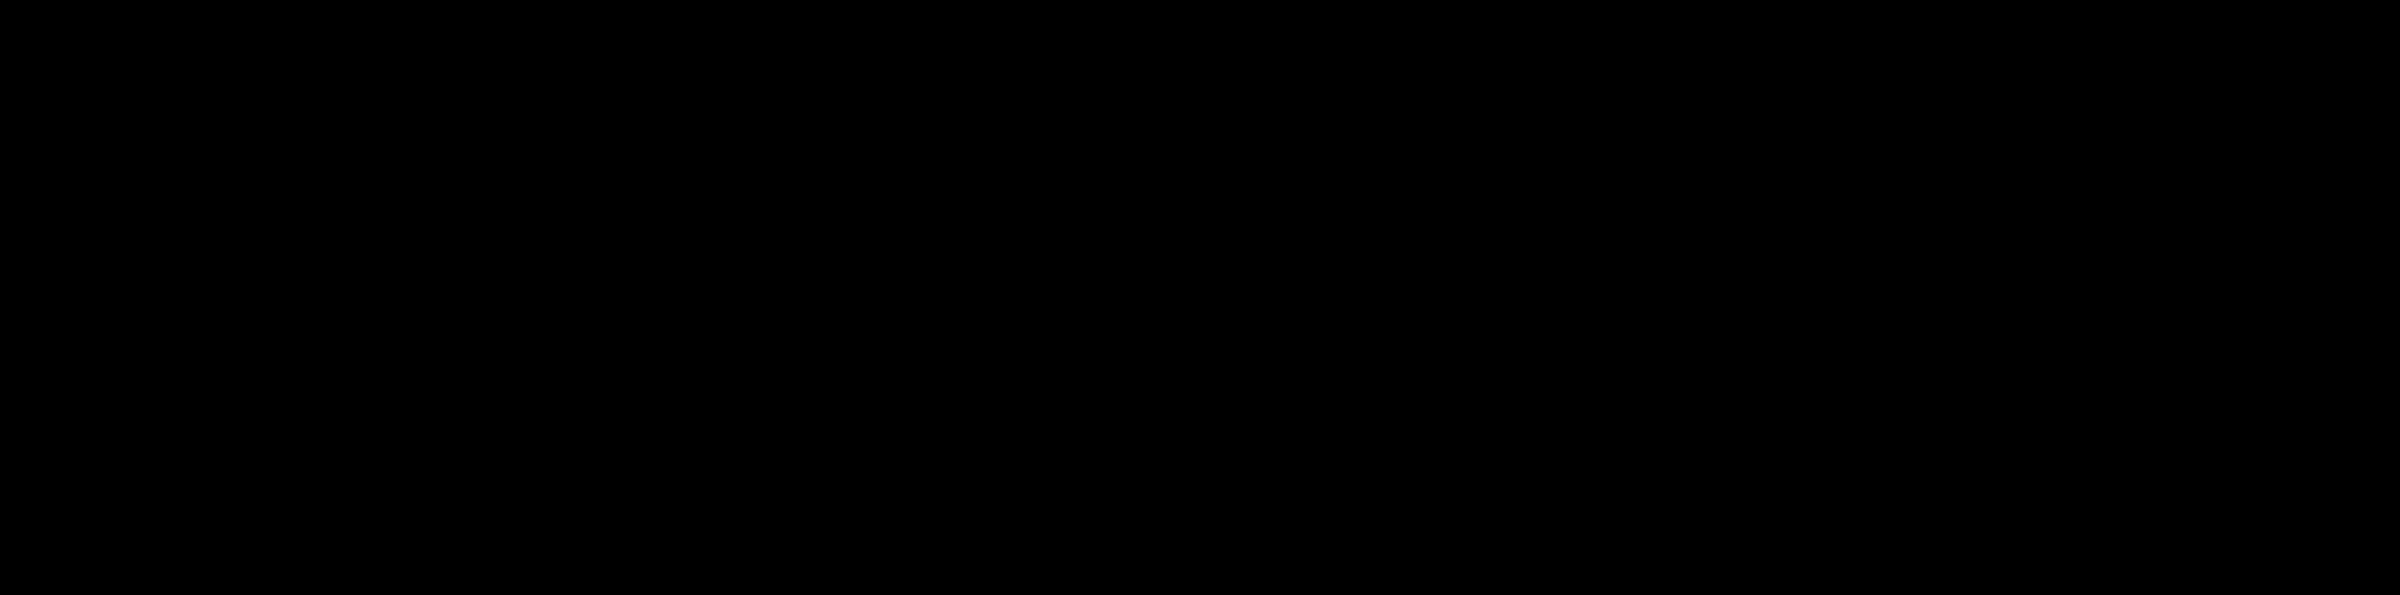 sony logo png transparent amp svg vector freebie supply